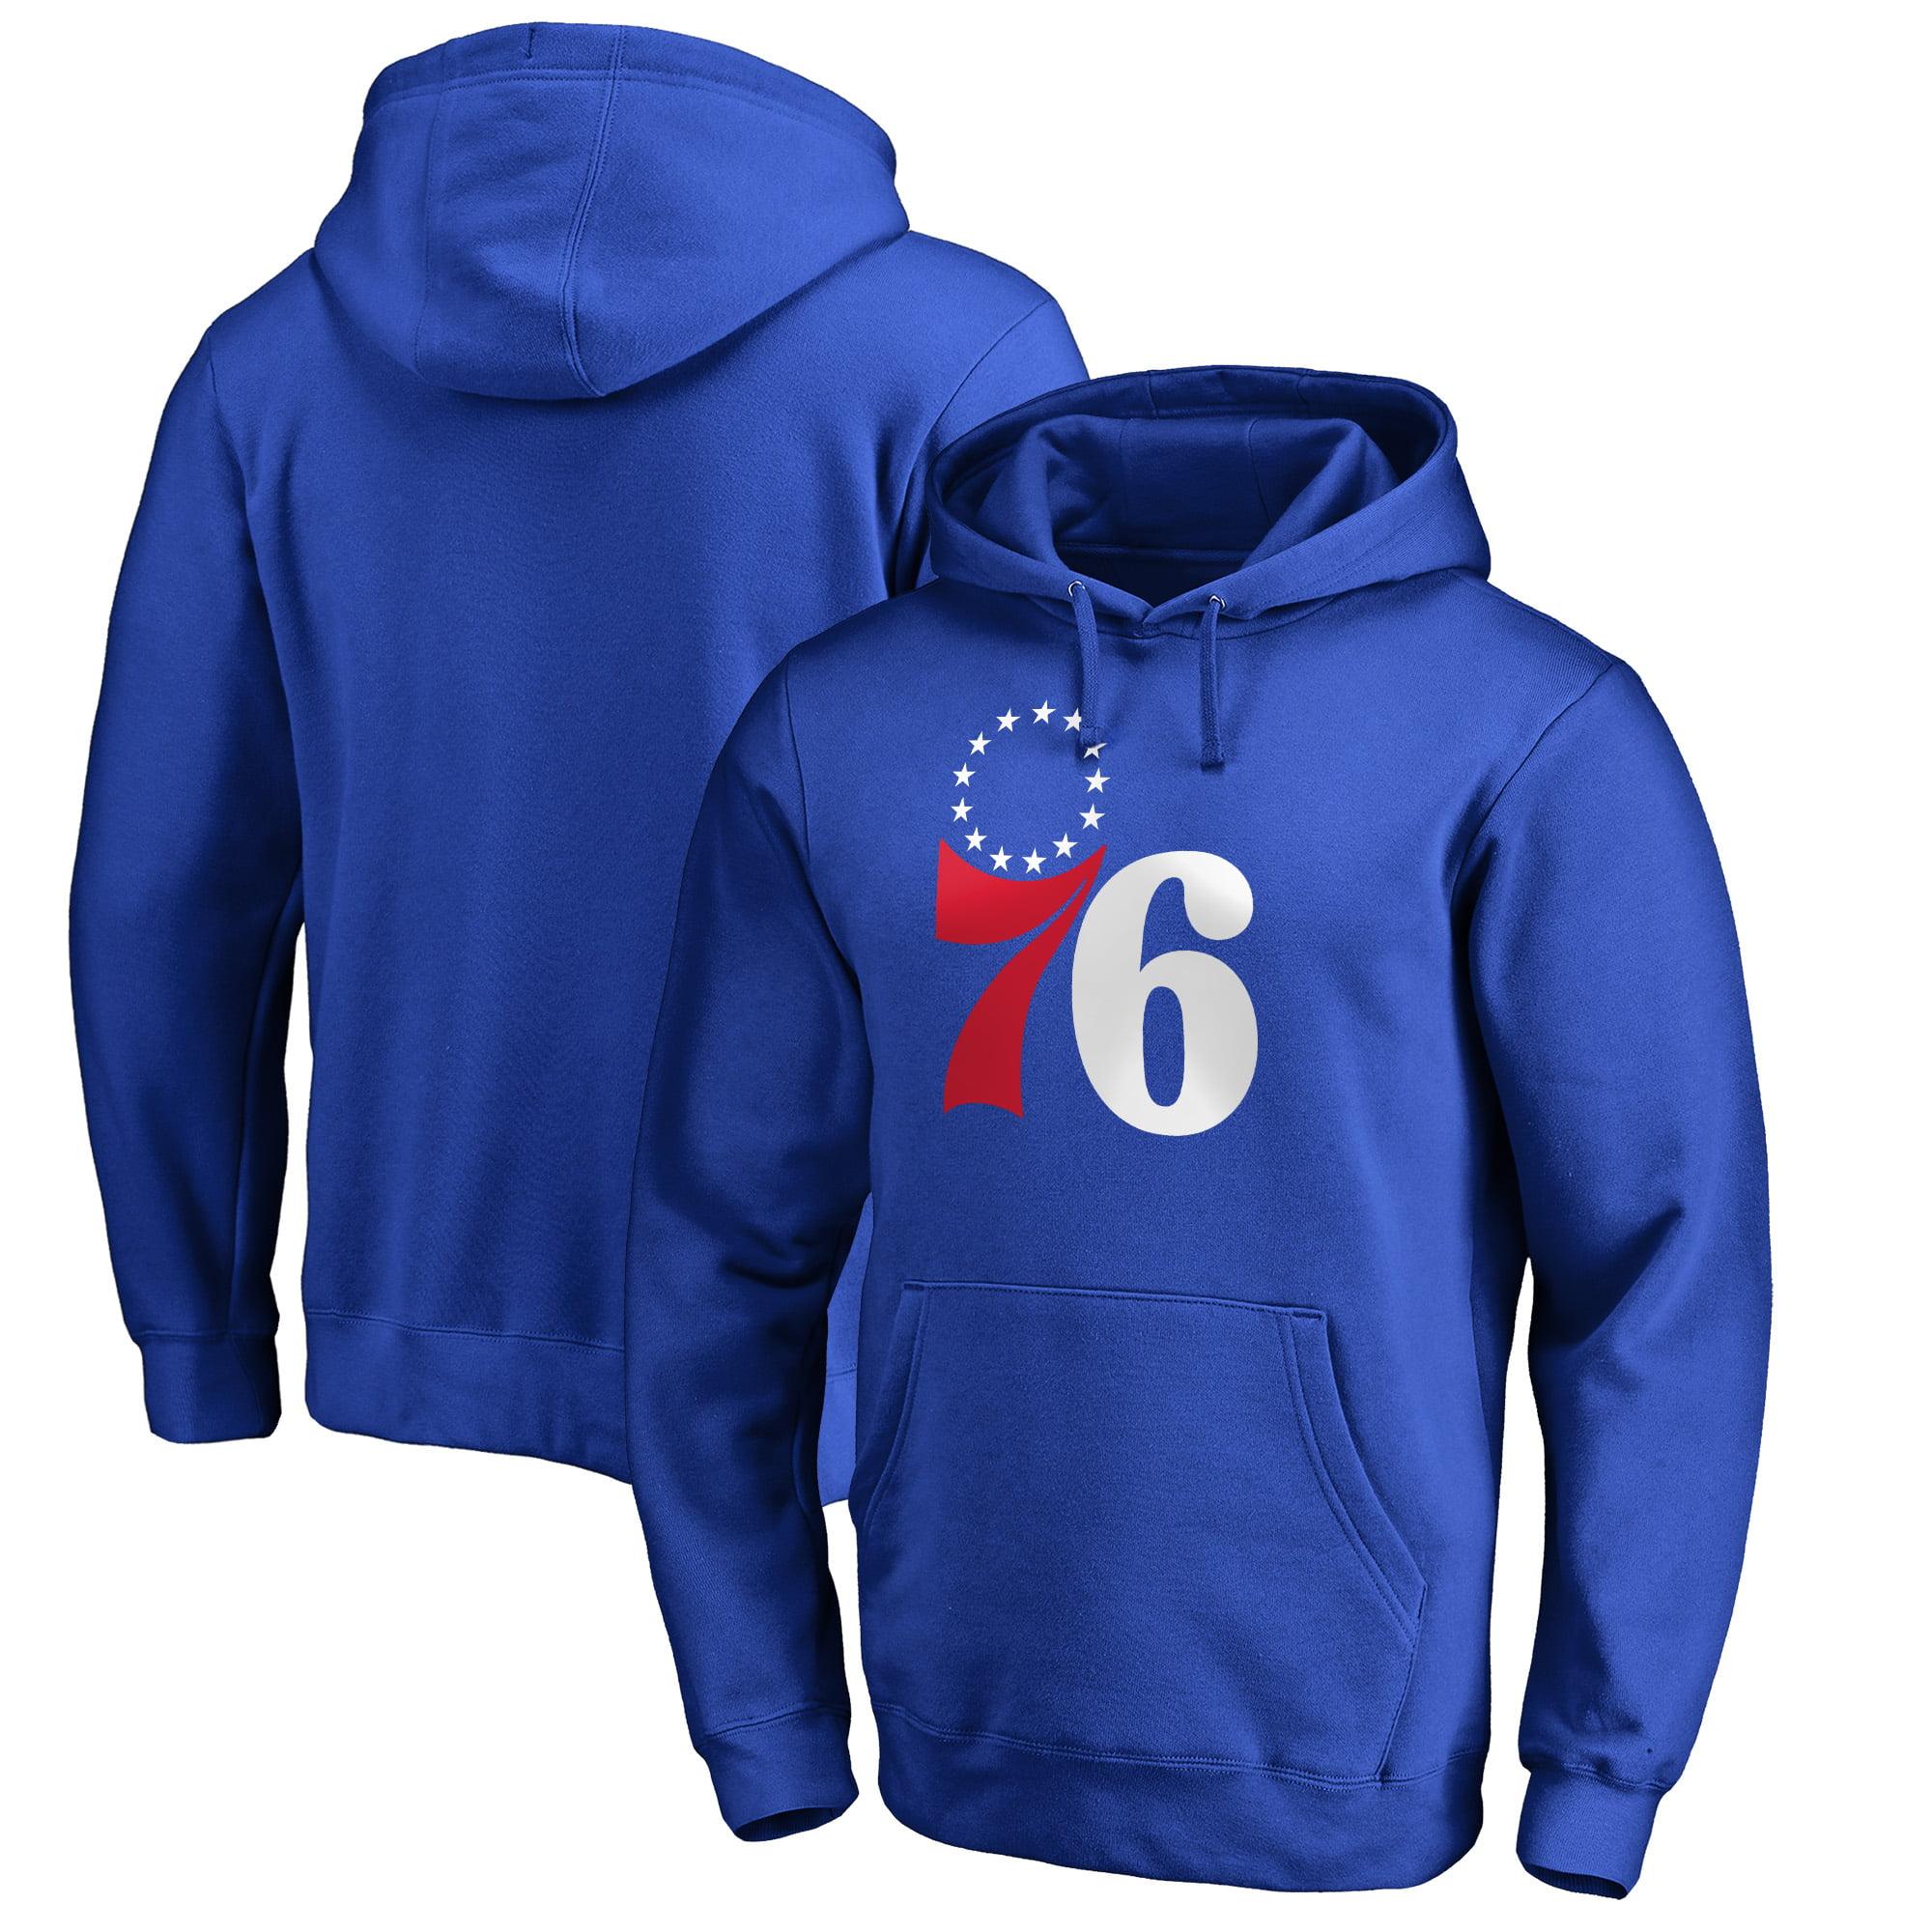 Philadelphia 76ers Fanatics Branded Secondary II Pullover Hoodie - Royal